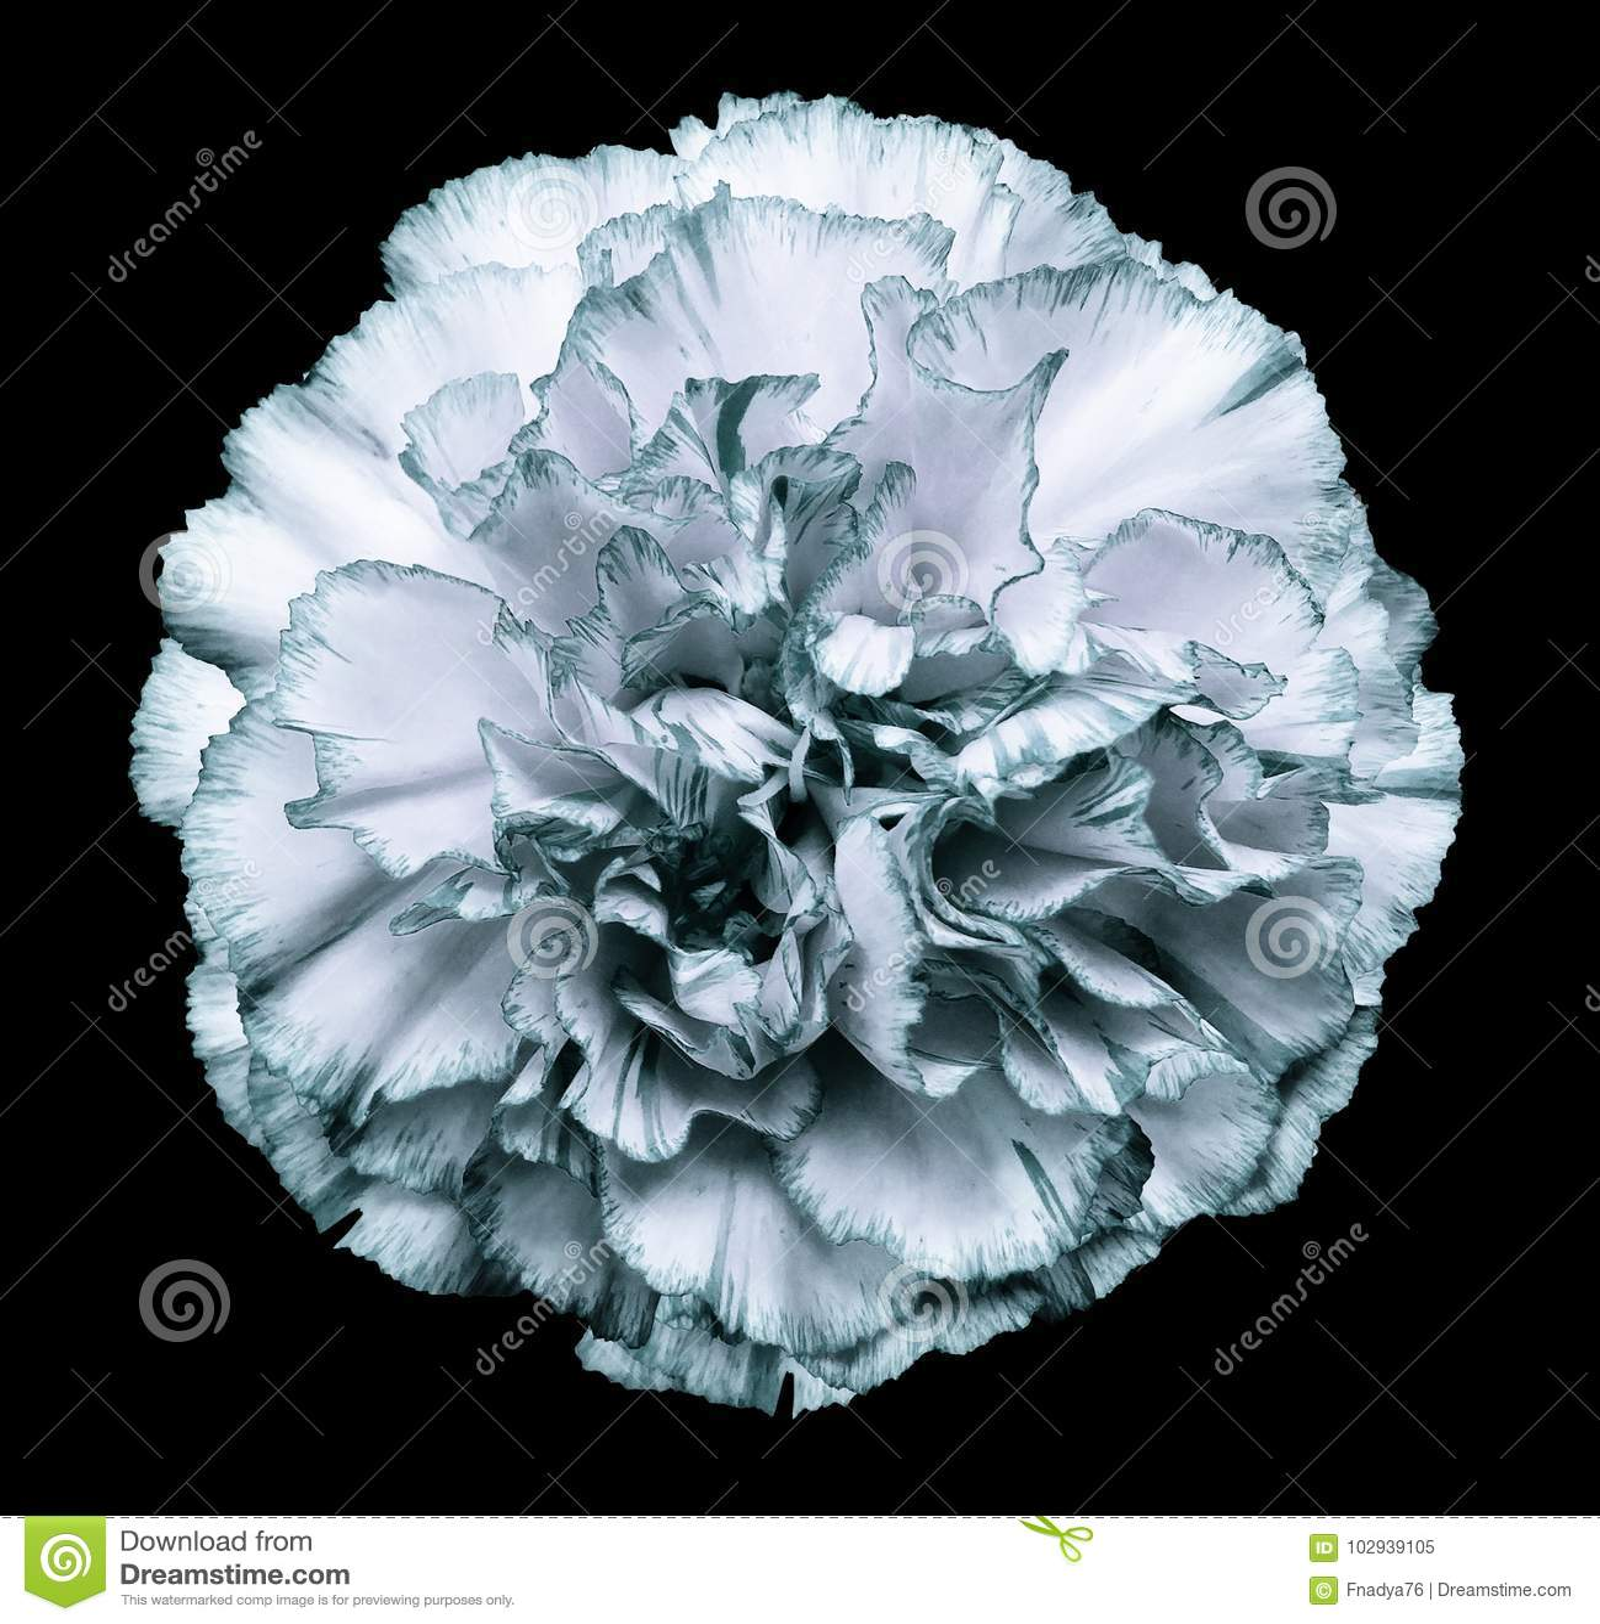 Flower White Turquoise Carnation On The Black Isolated Background